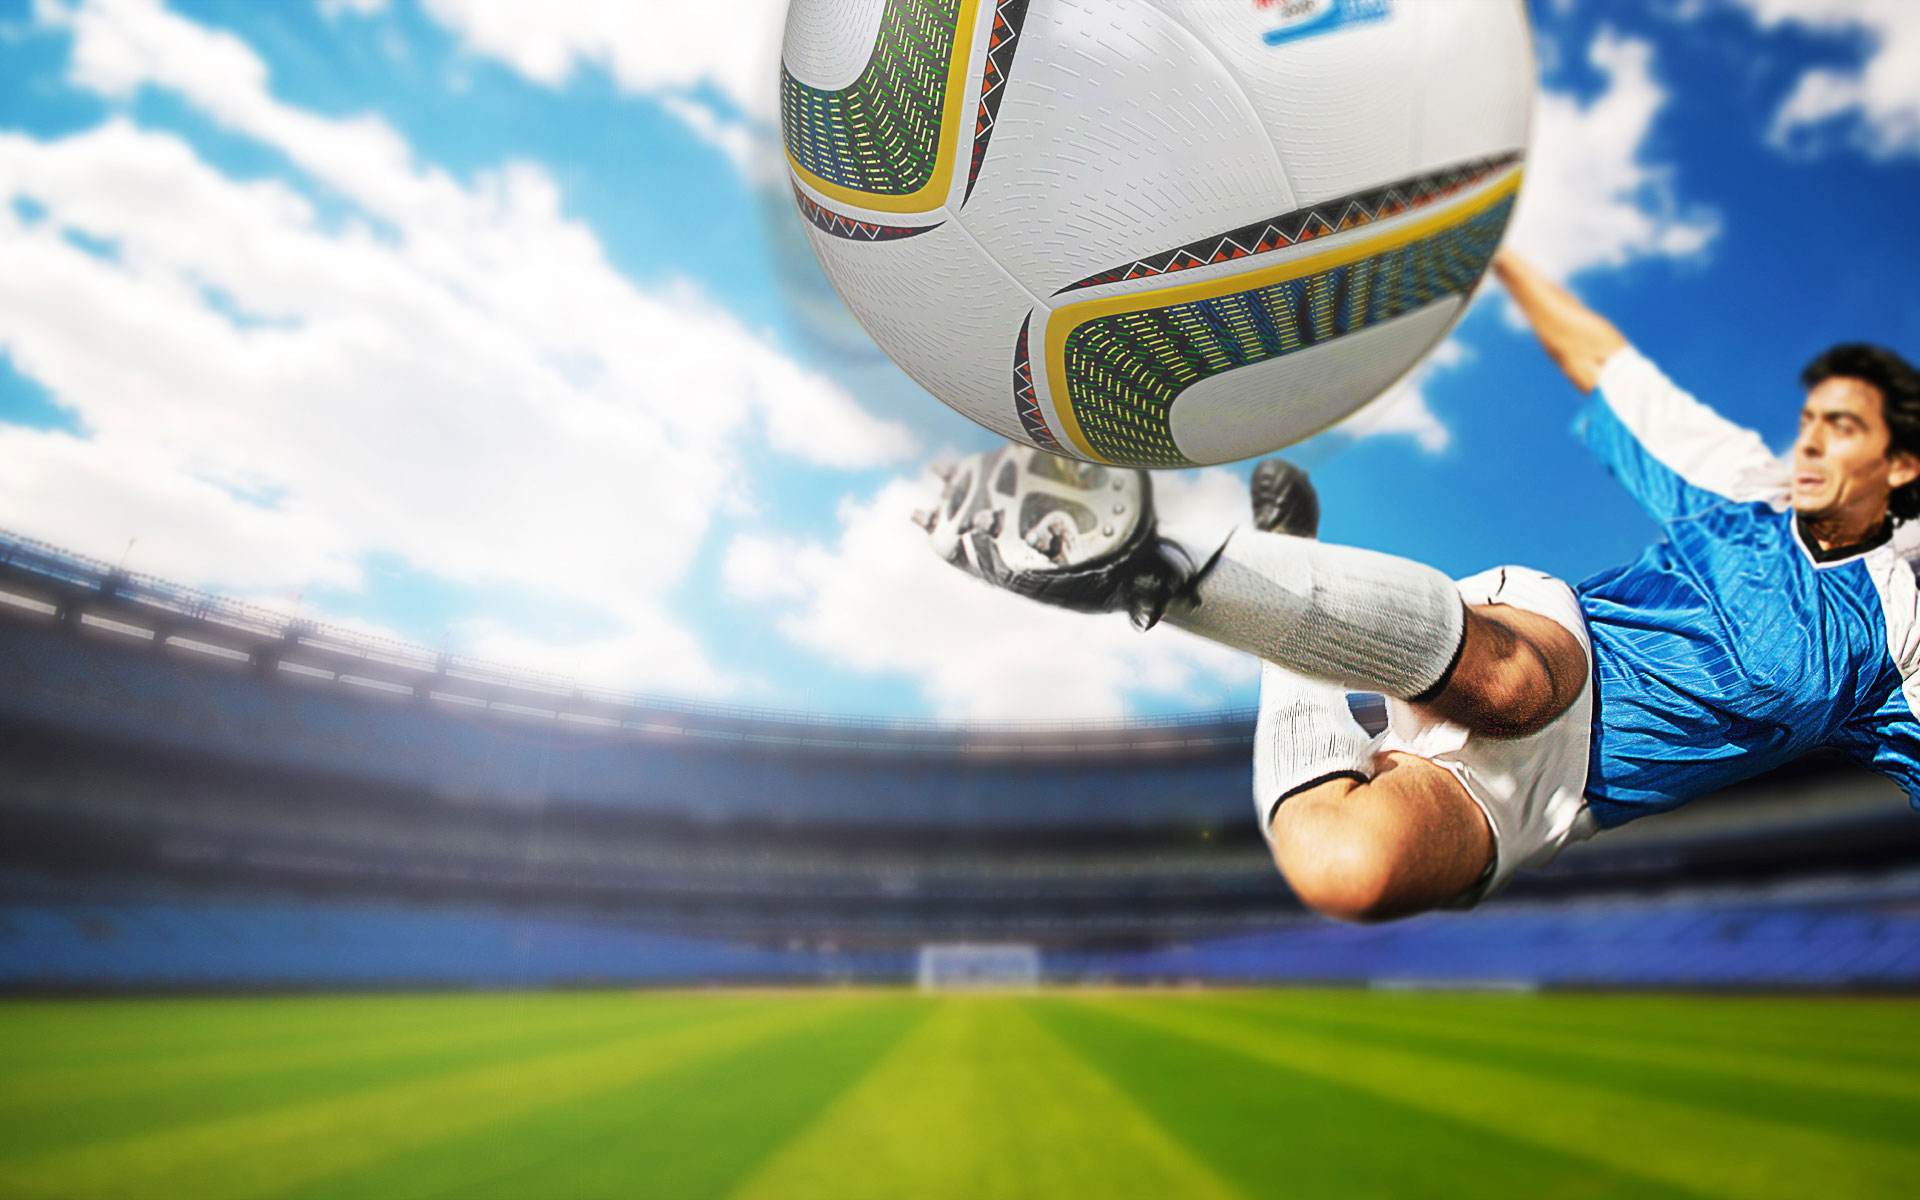 American Football Quotes Wallpaper Cool Sports Backgrounds Hd Pixelstalk Net